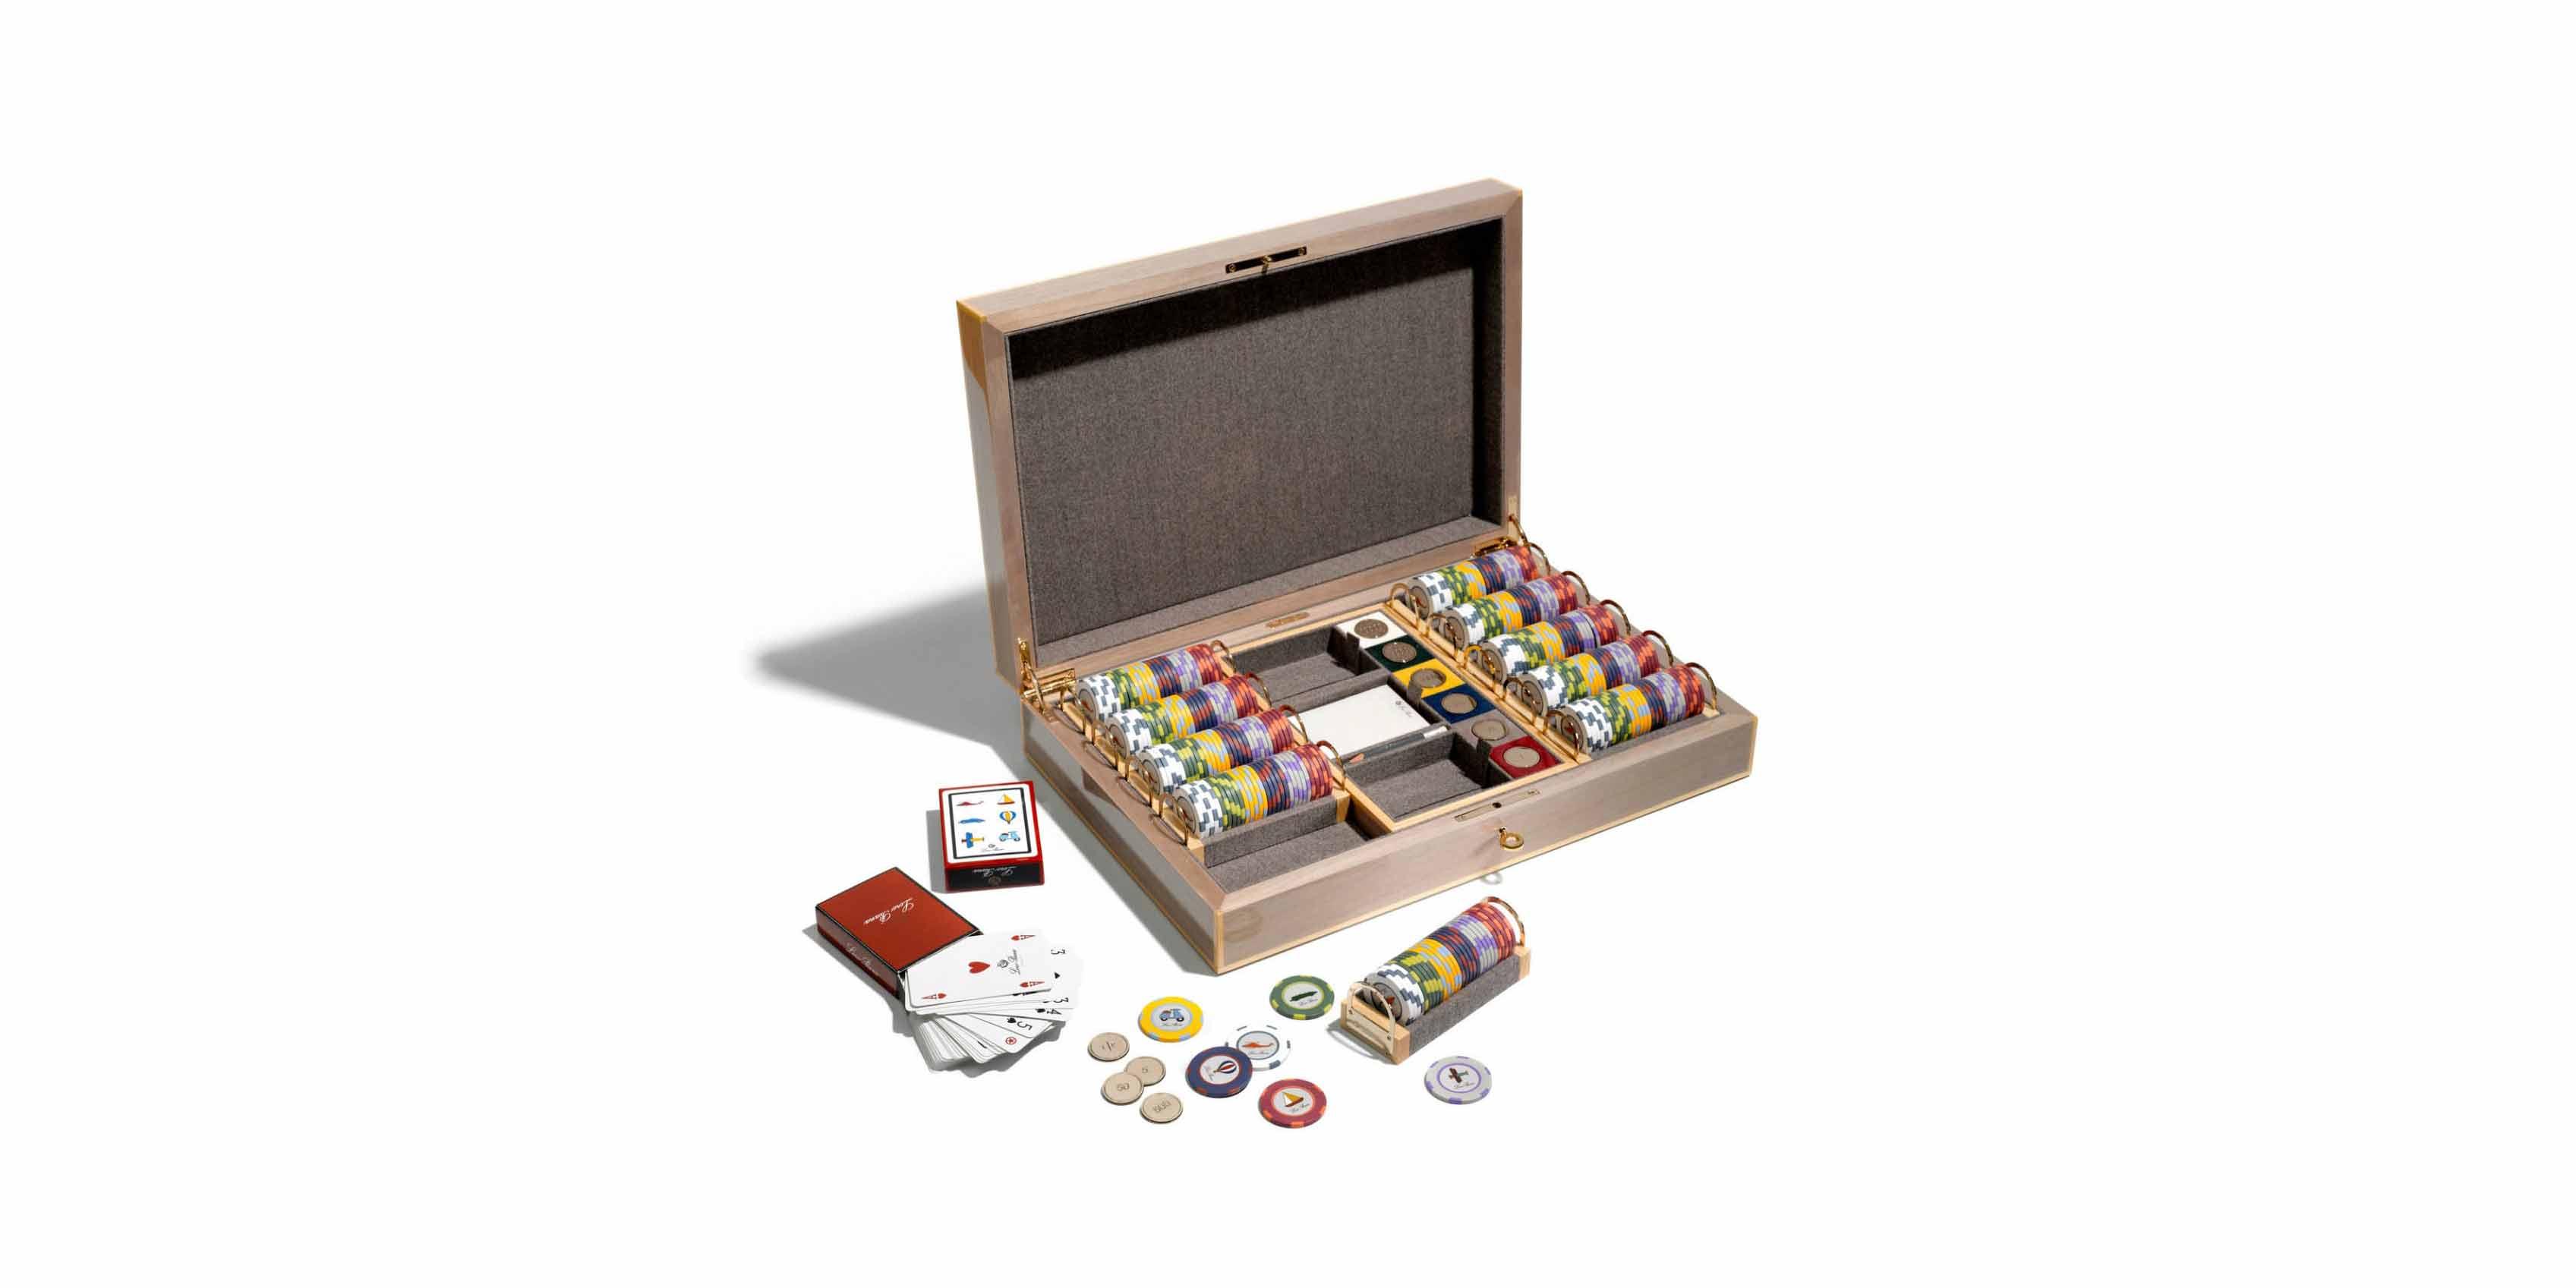 Poker trichedit schecter blackjack atx c-1 fr review